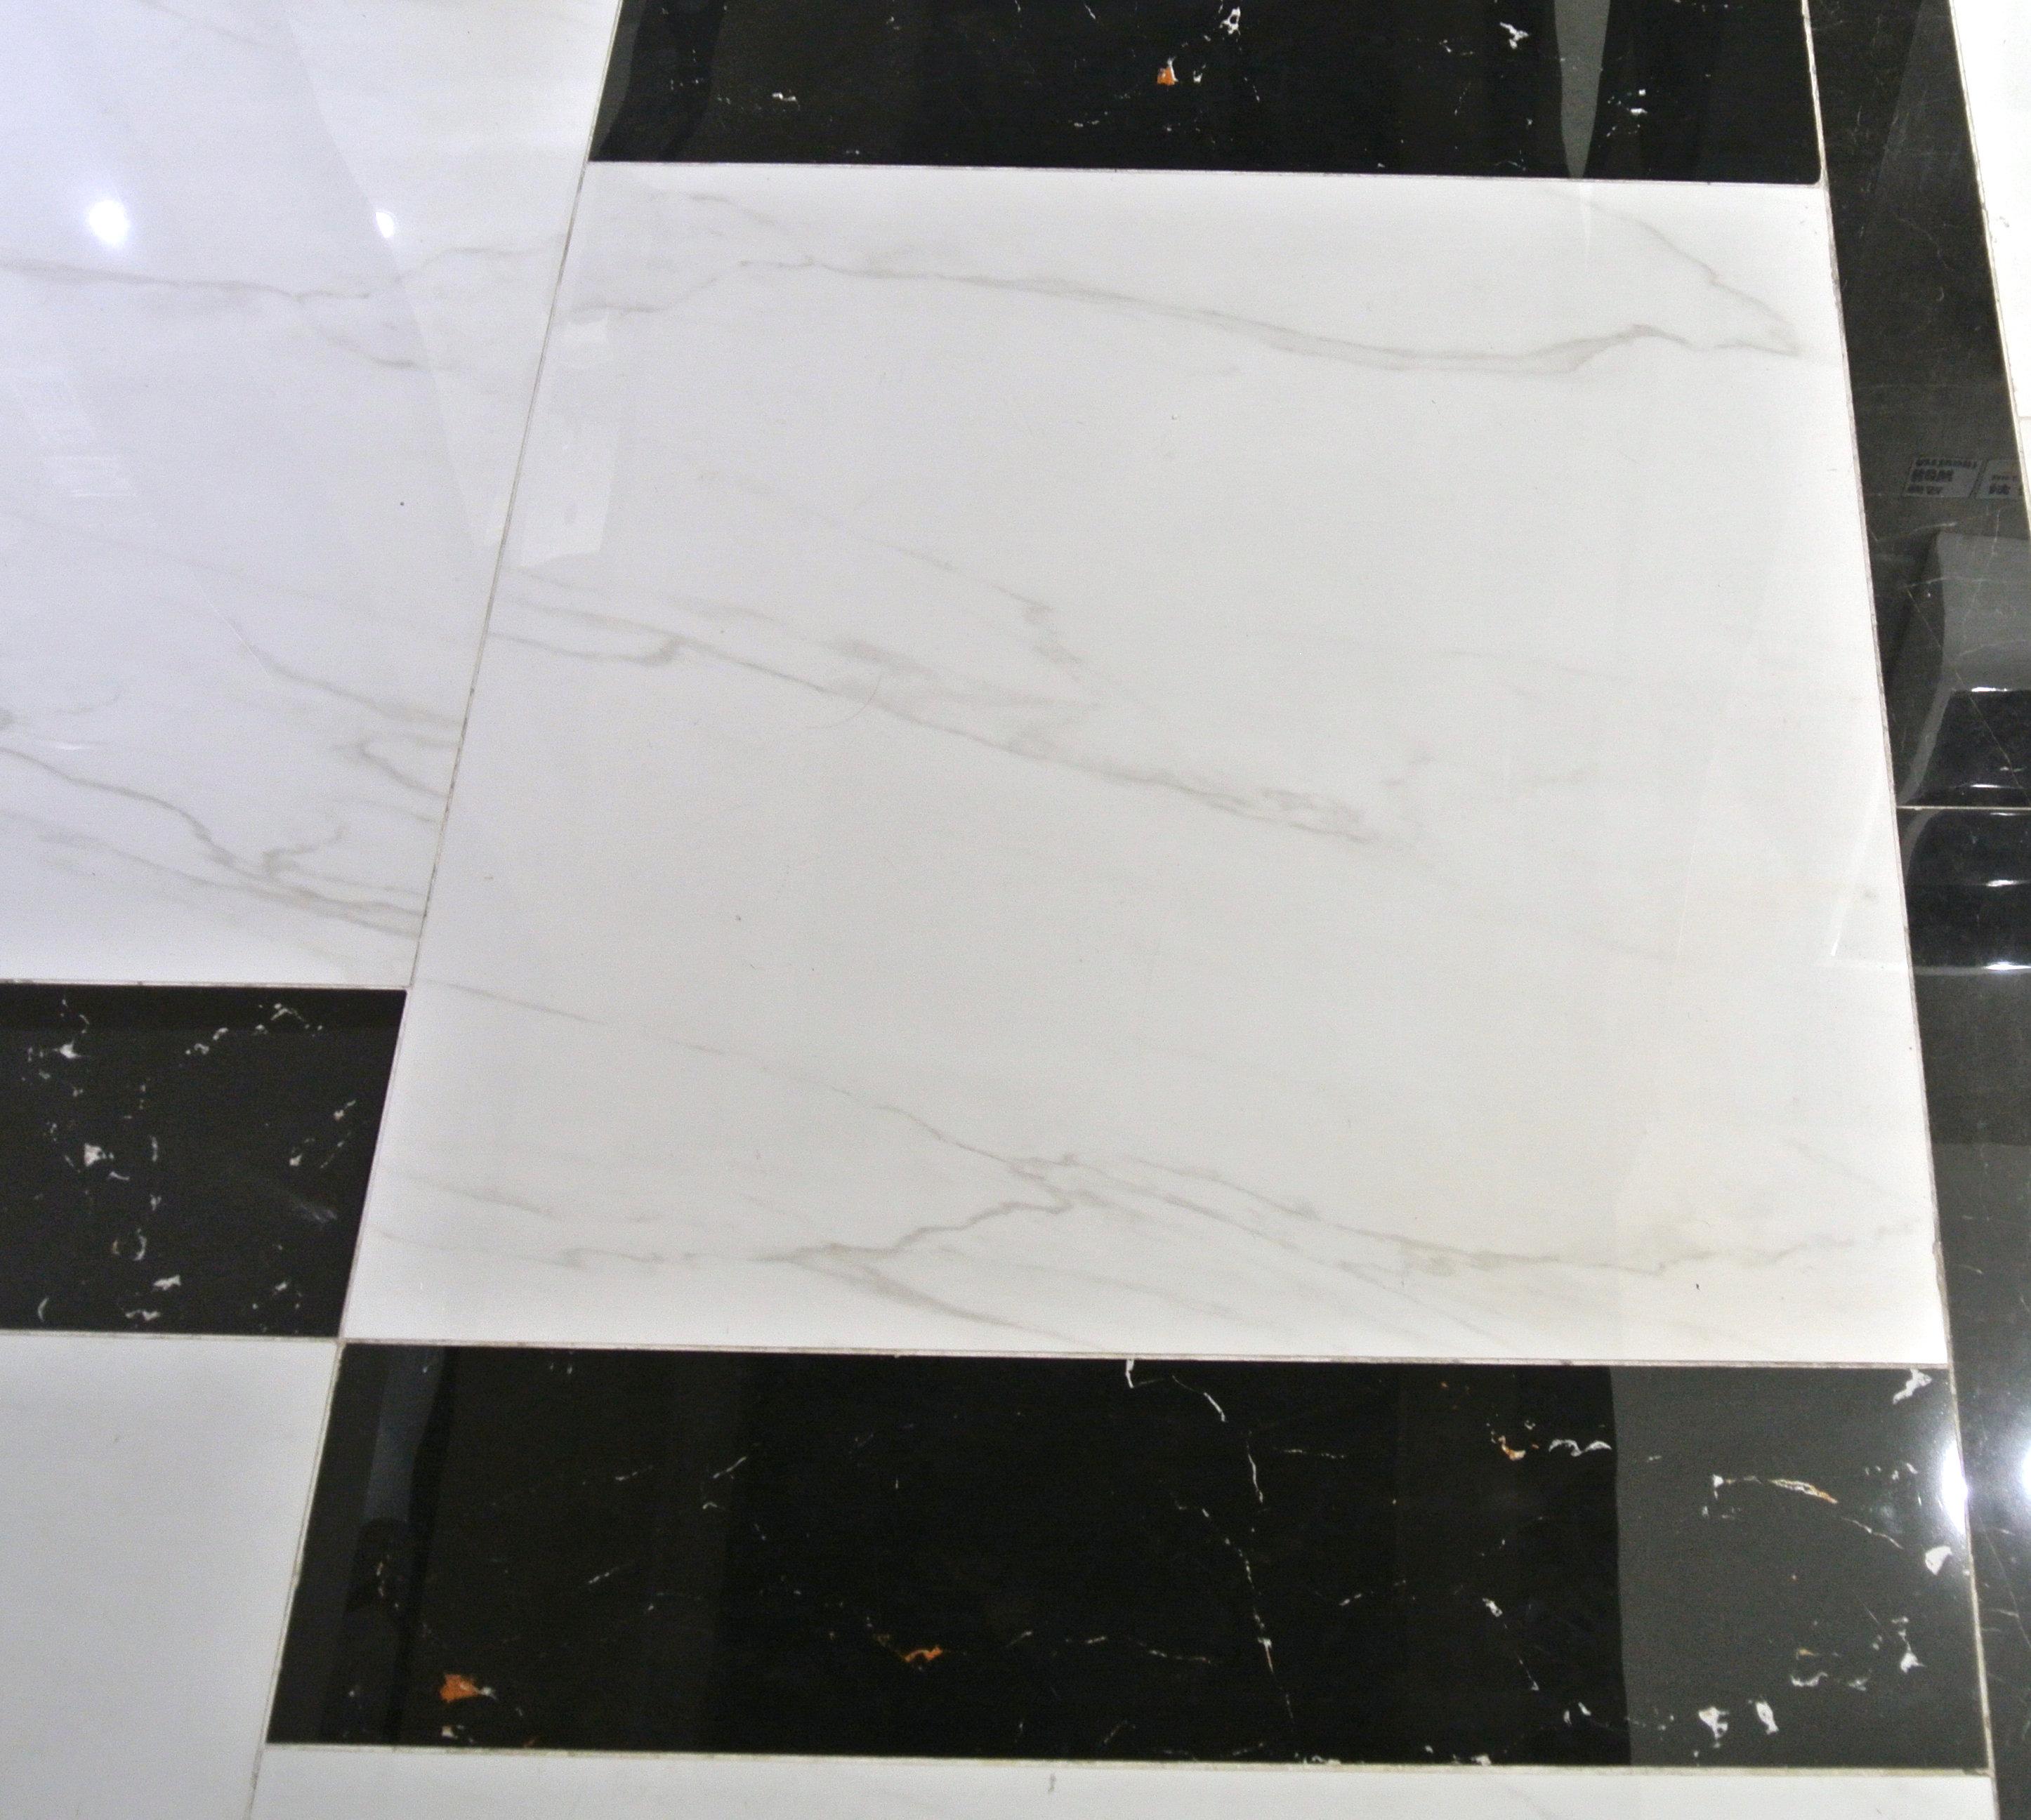 ARROW 箭牌瓷砖 全抛釉 冰心印玉 ACS272080P 白色